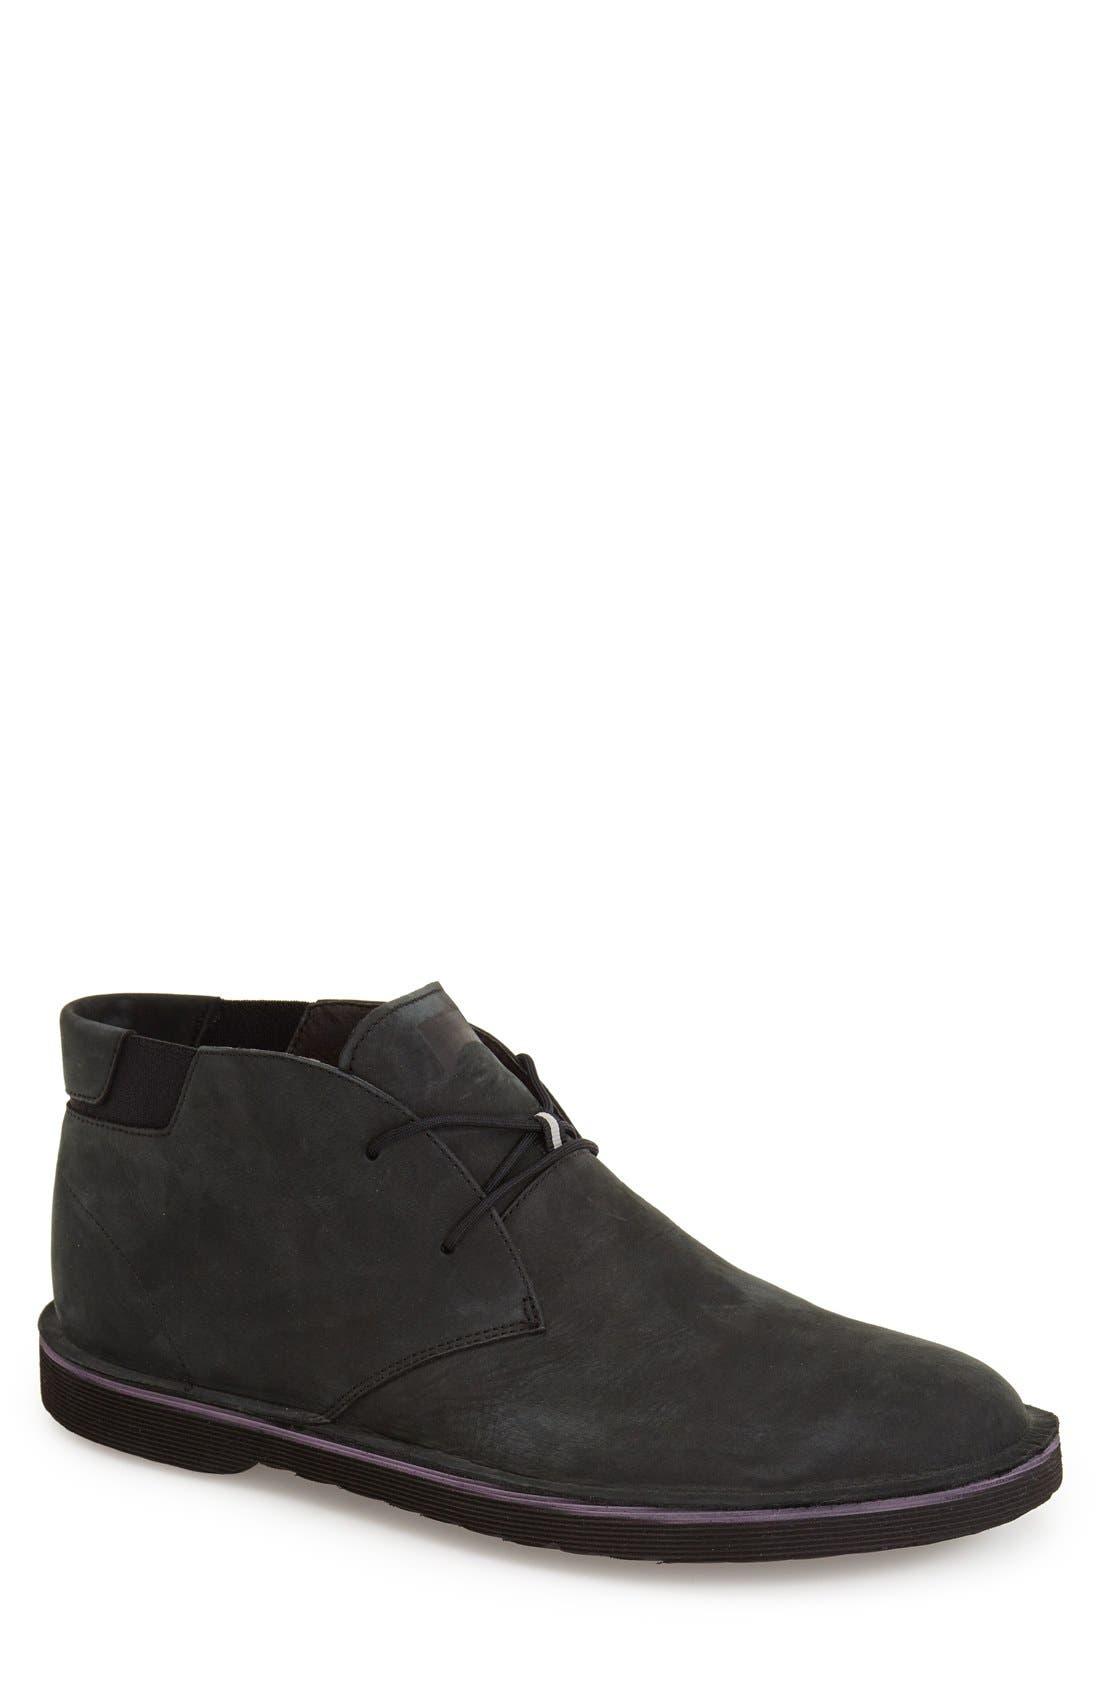 'Morrys' Chukka Boot, Main, color, 001